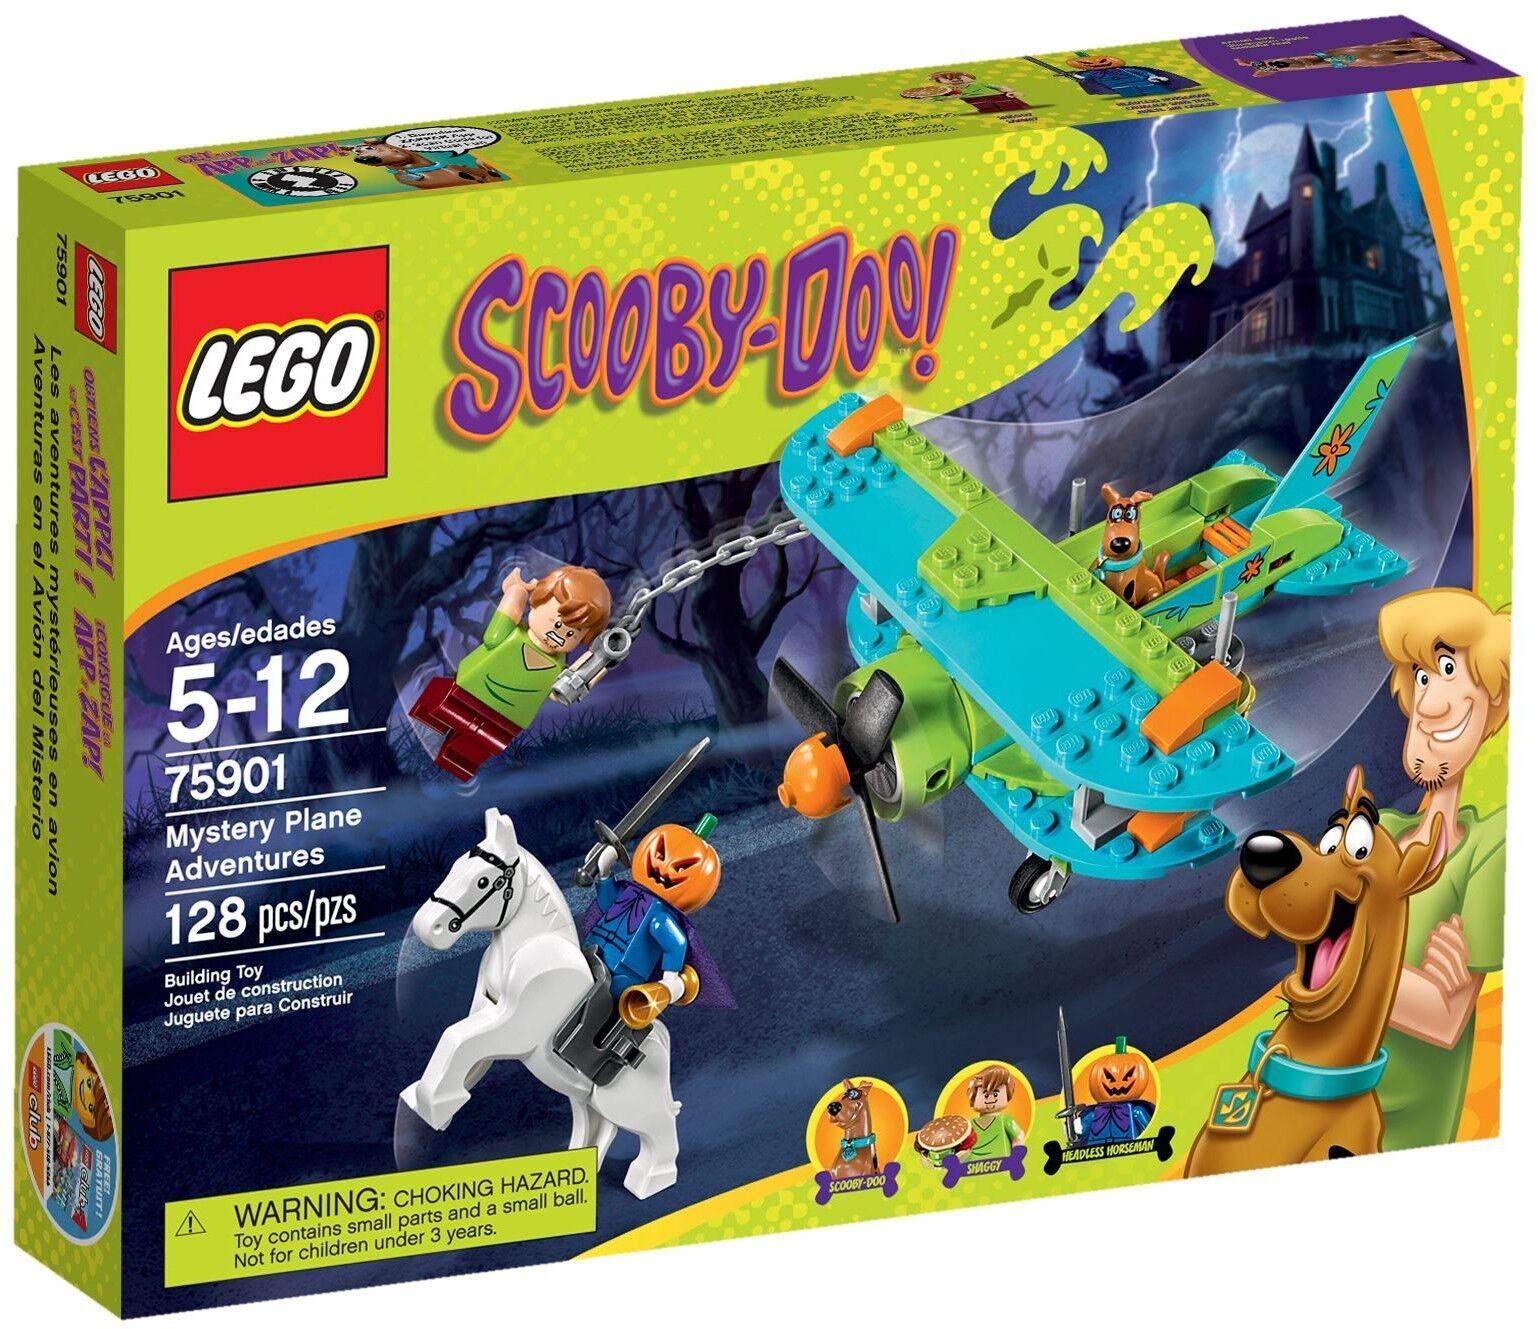 BNIB Lego Scooby Doo 75901 Mystery Plane Adventures Adventures Adventures Shaggy pumpkin halloween f9ff8b